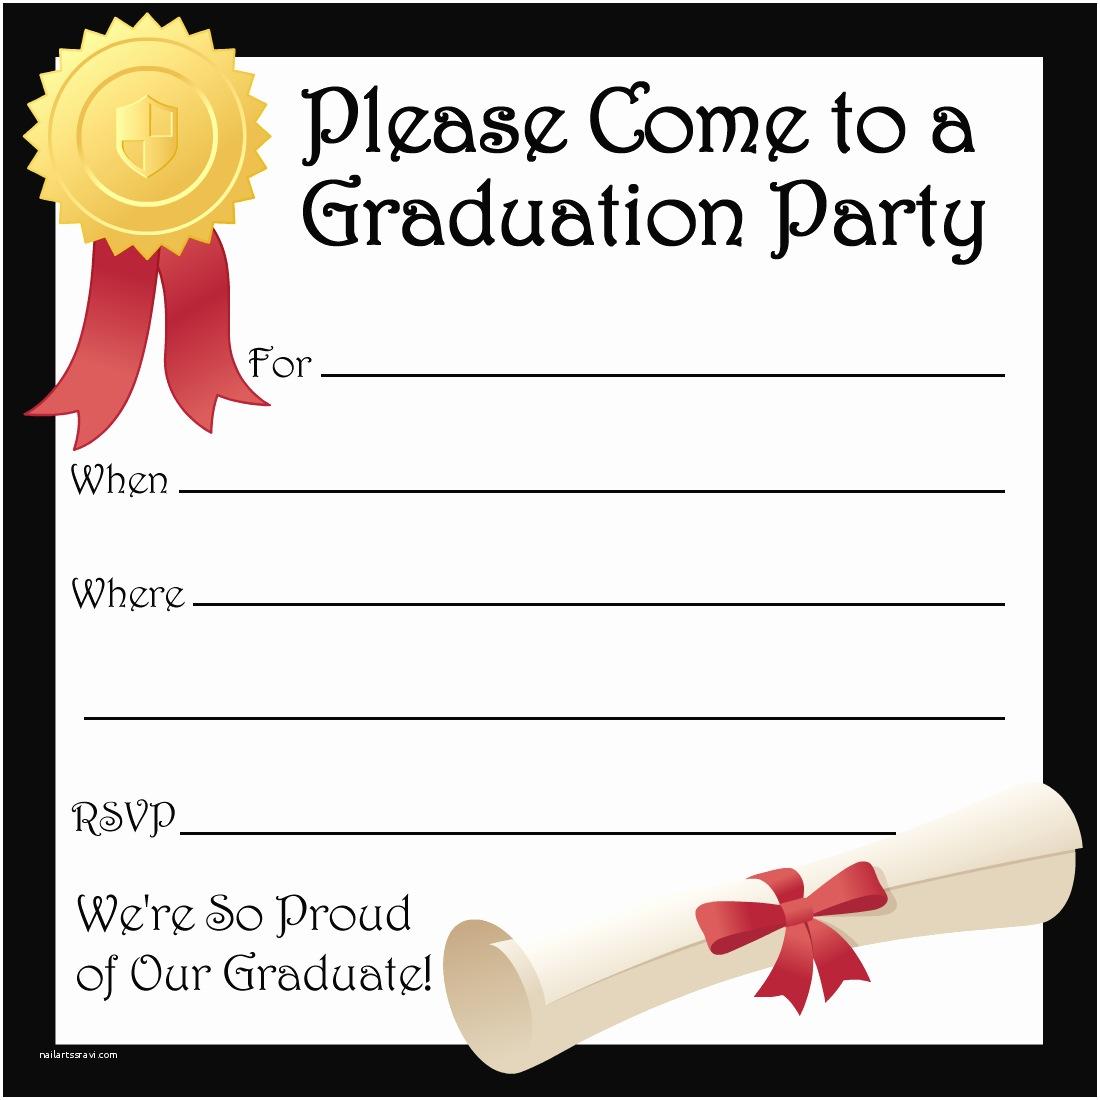 Graduation Party Invites Free Printable Graduation Party Invitations